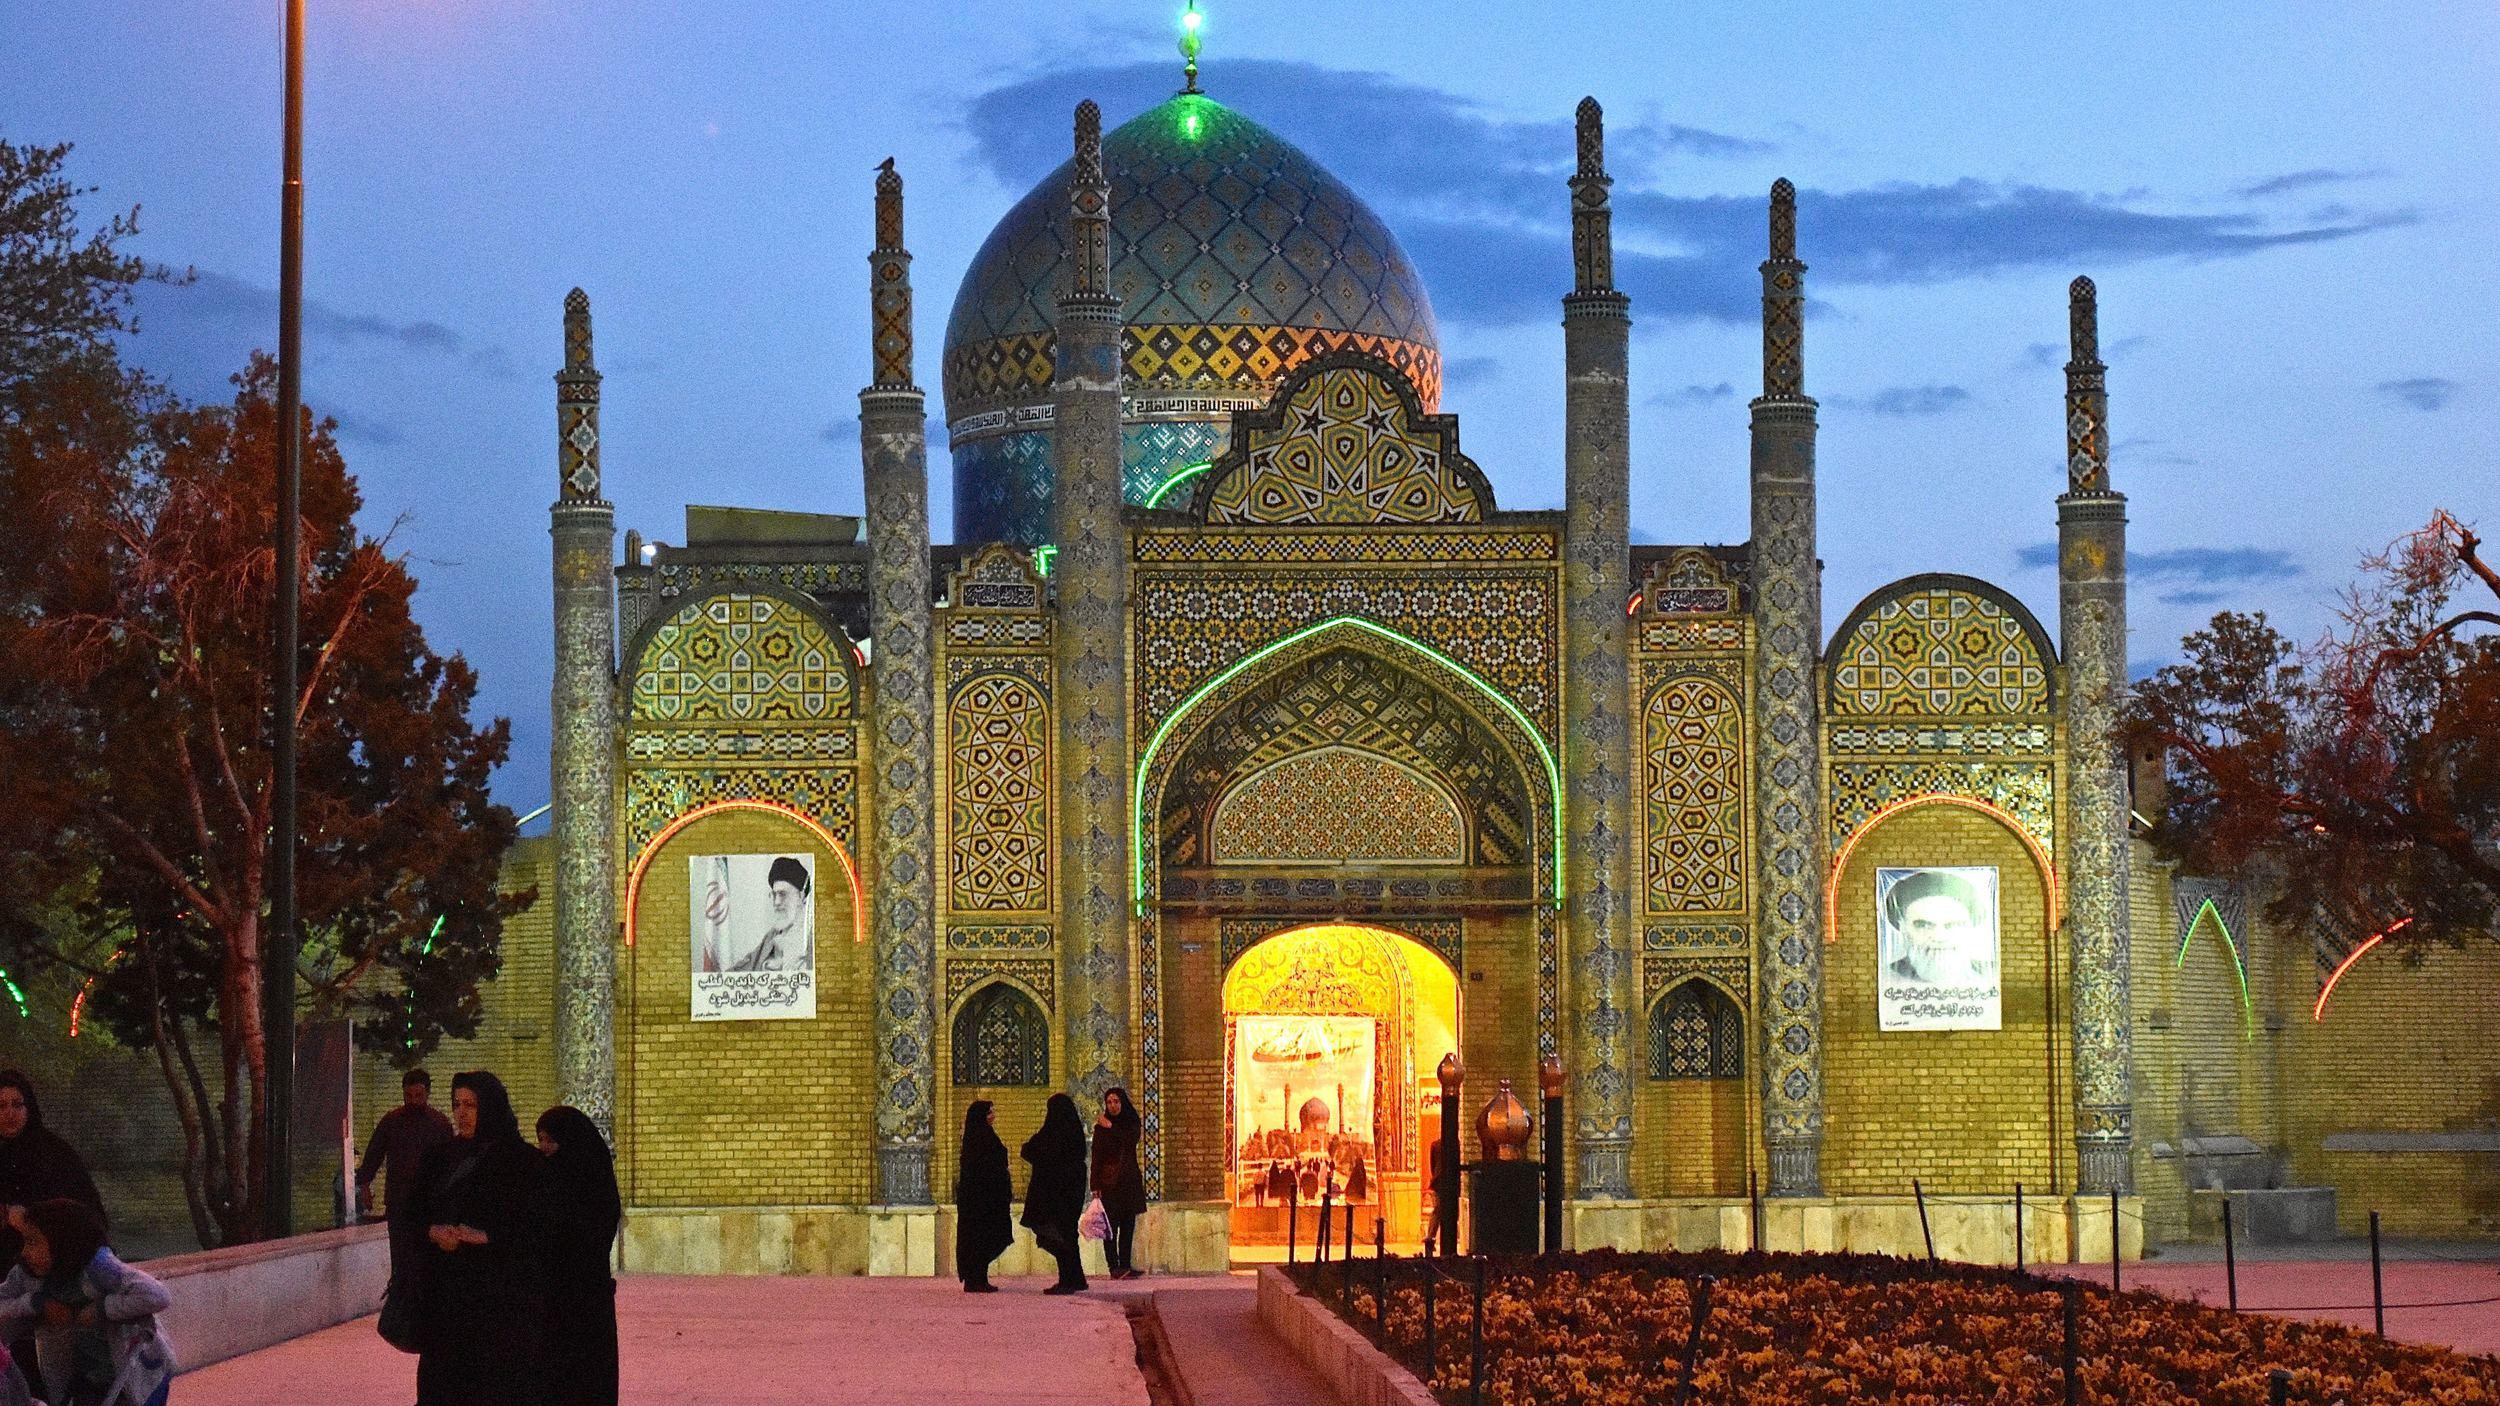 Iran-NW-Qazvin-Imamzadeh.jpg